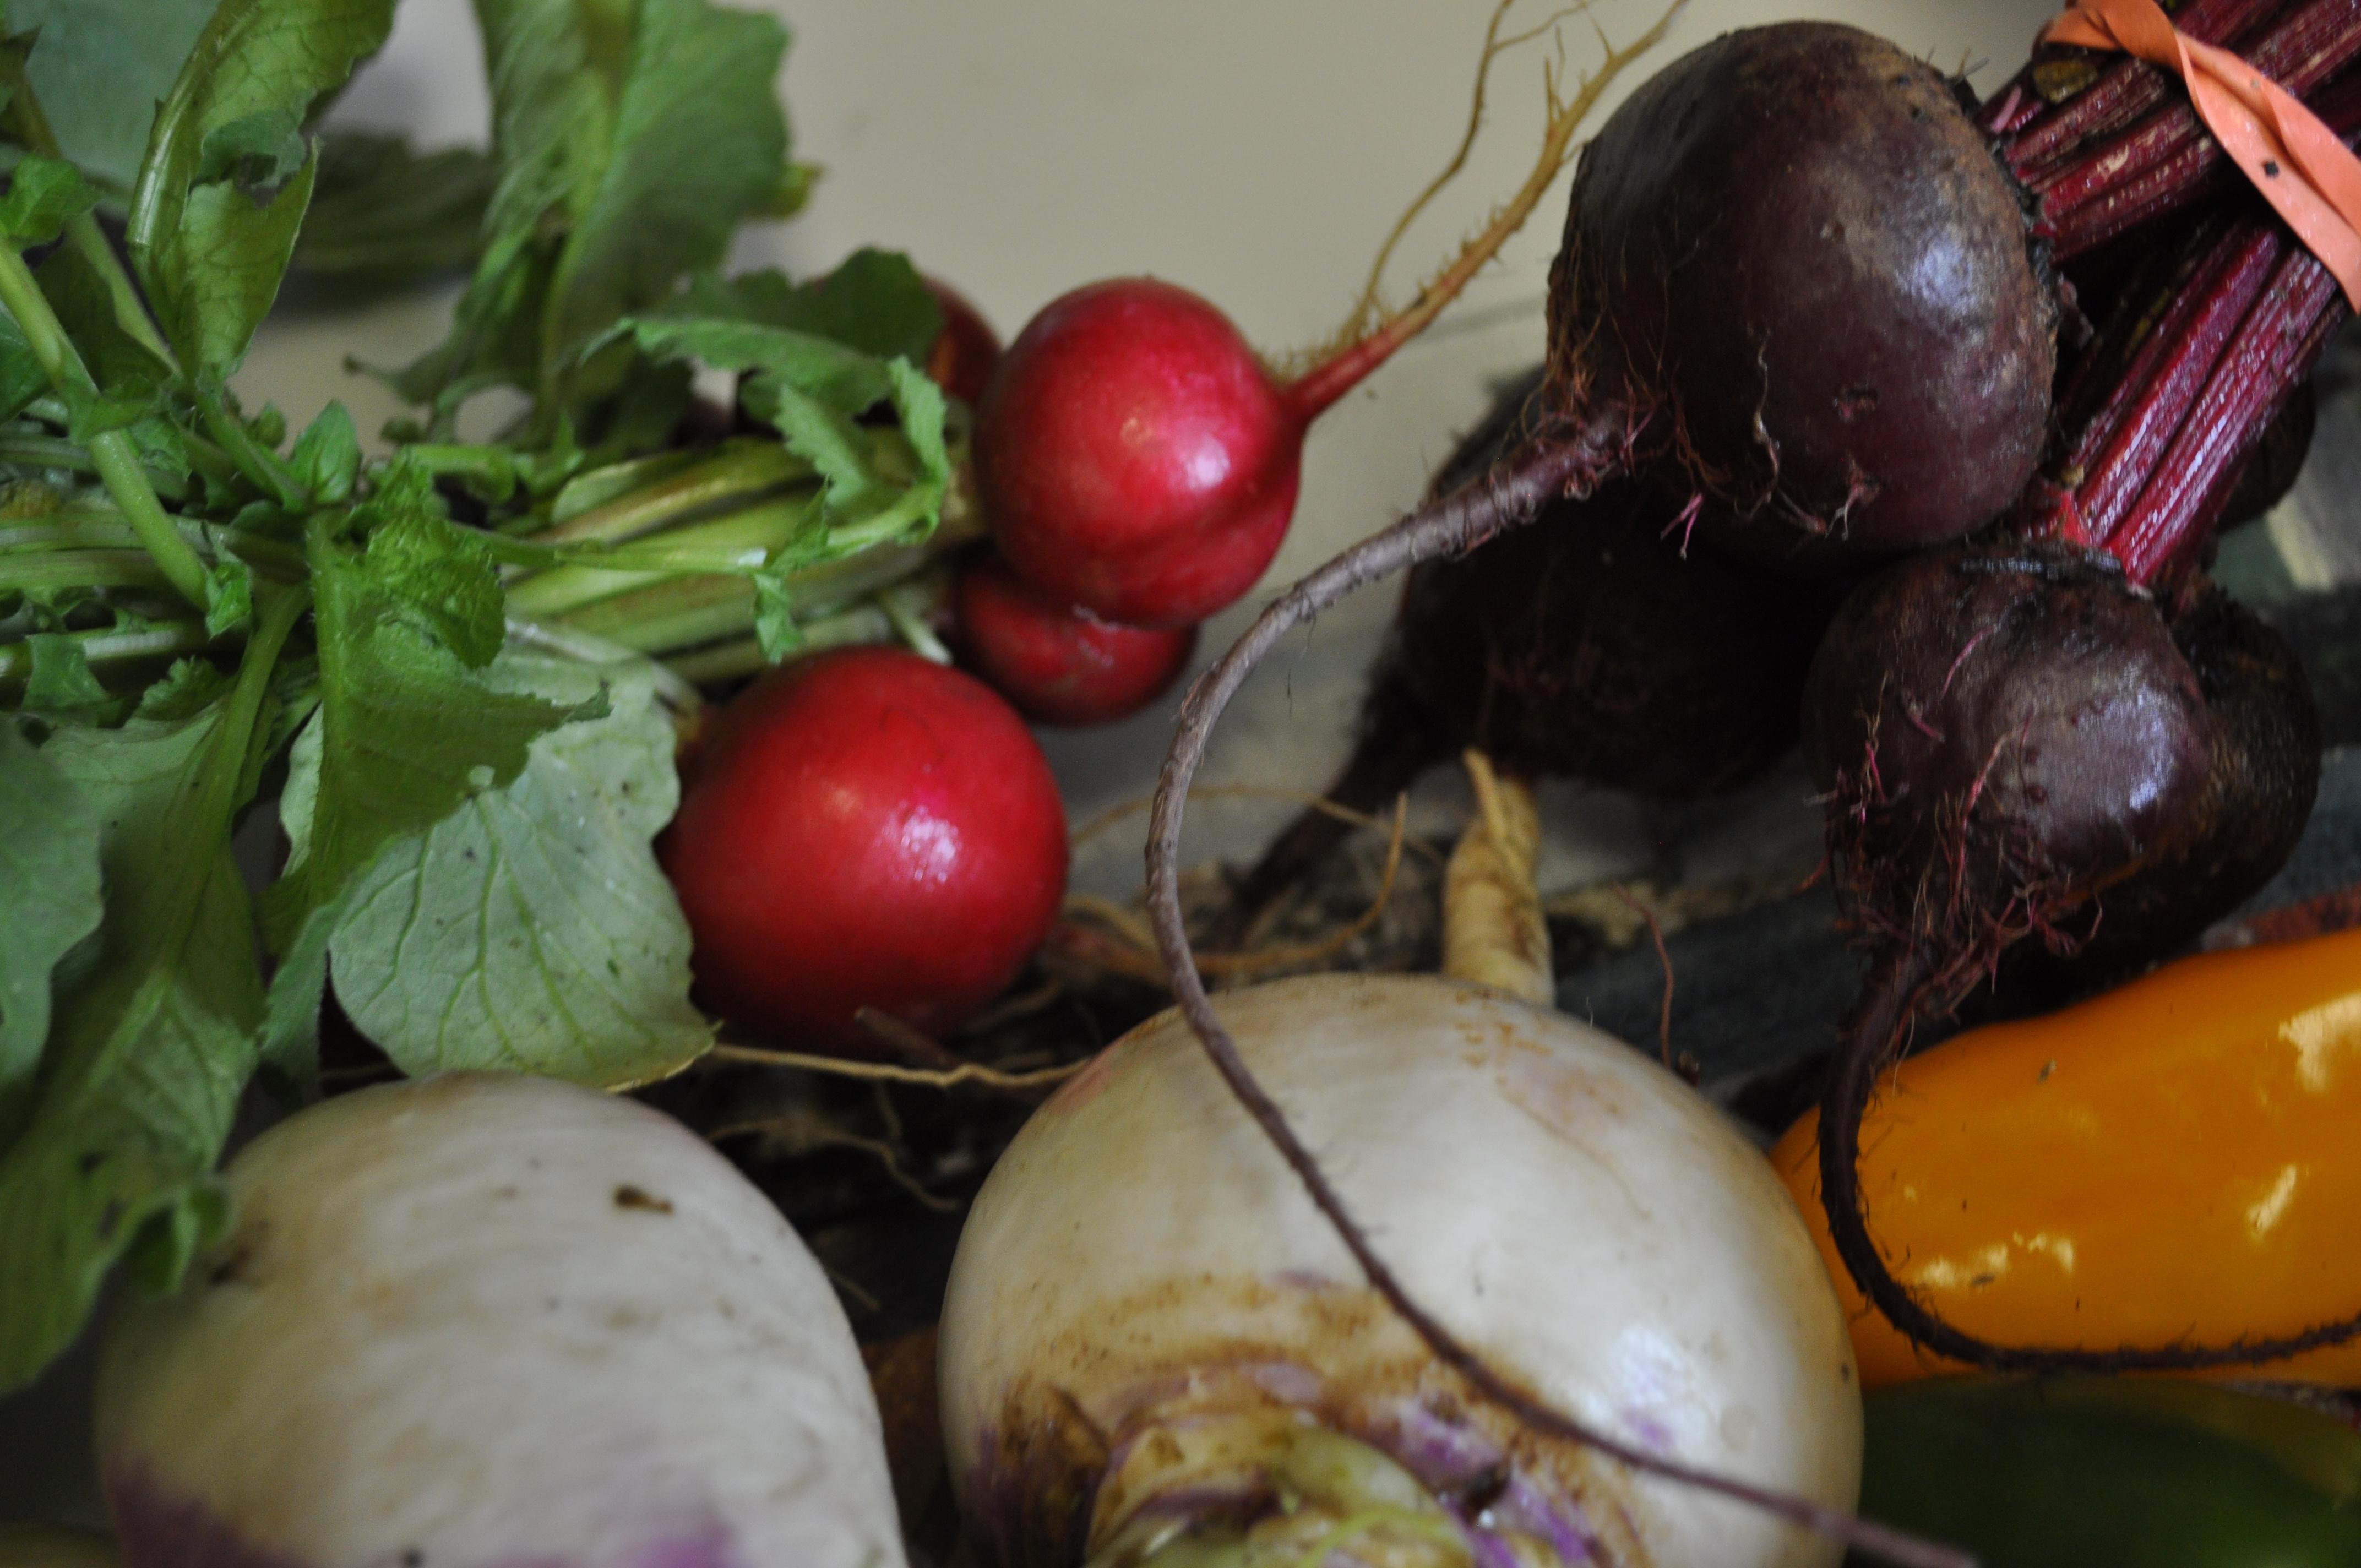 csa-and-more-interesting-veggies-022